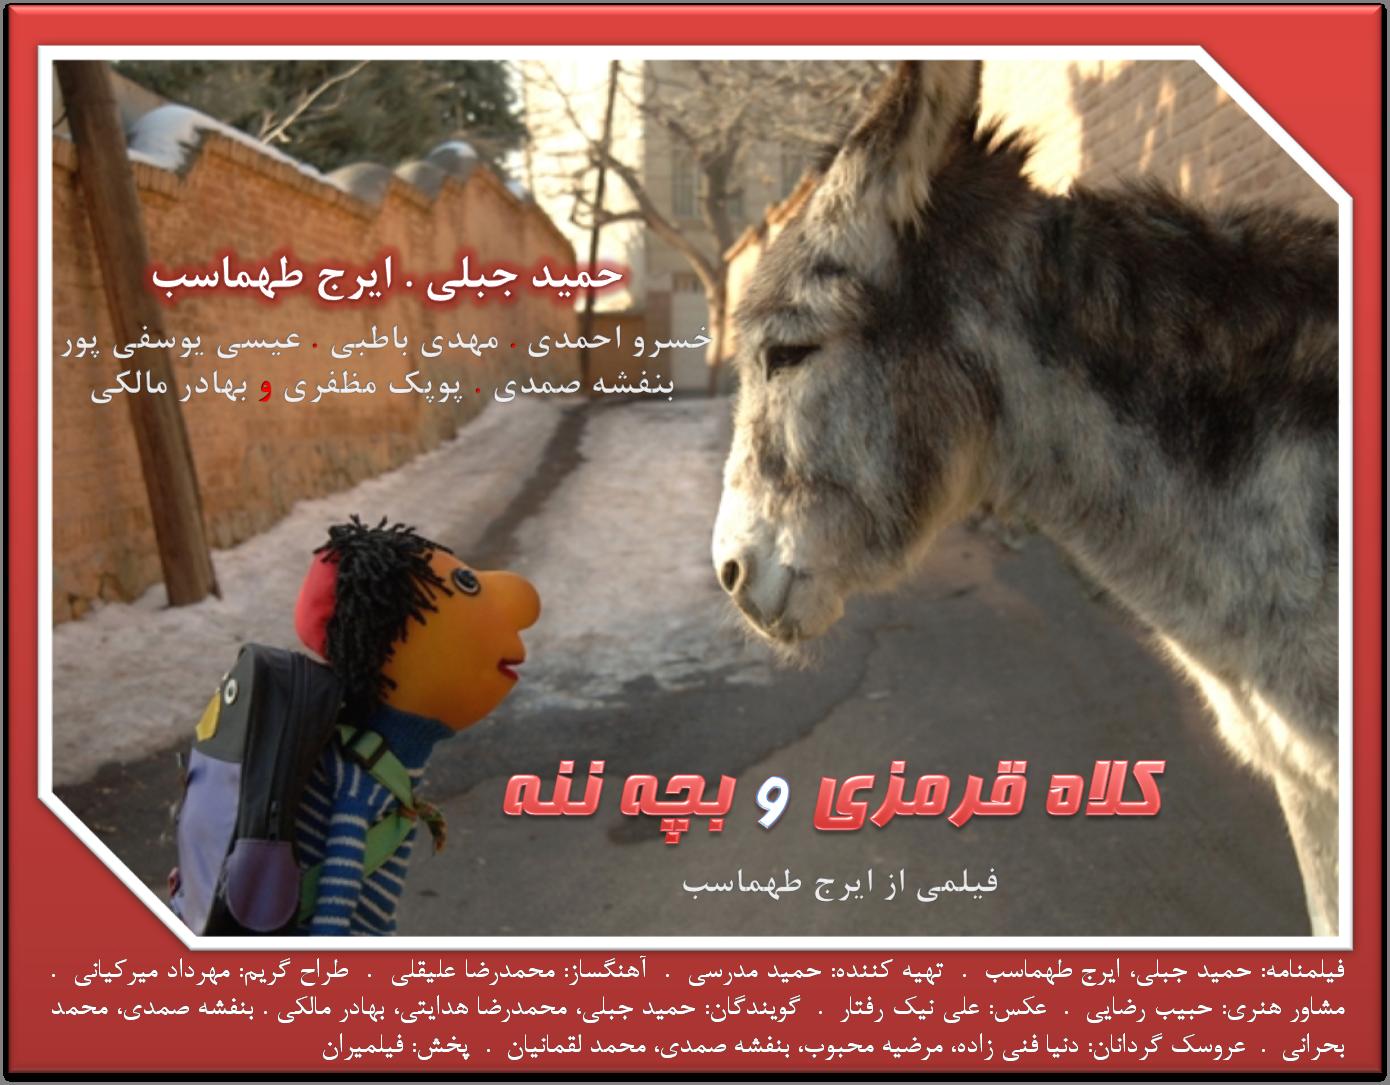 http://alirezaaghaebrahimi.persiangig.com/image/Picture3.png